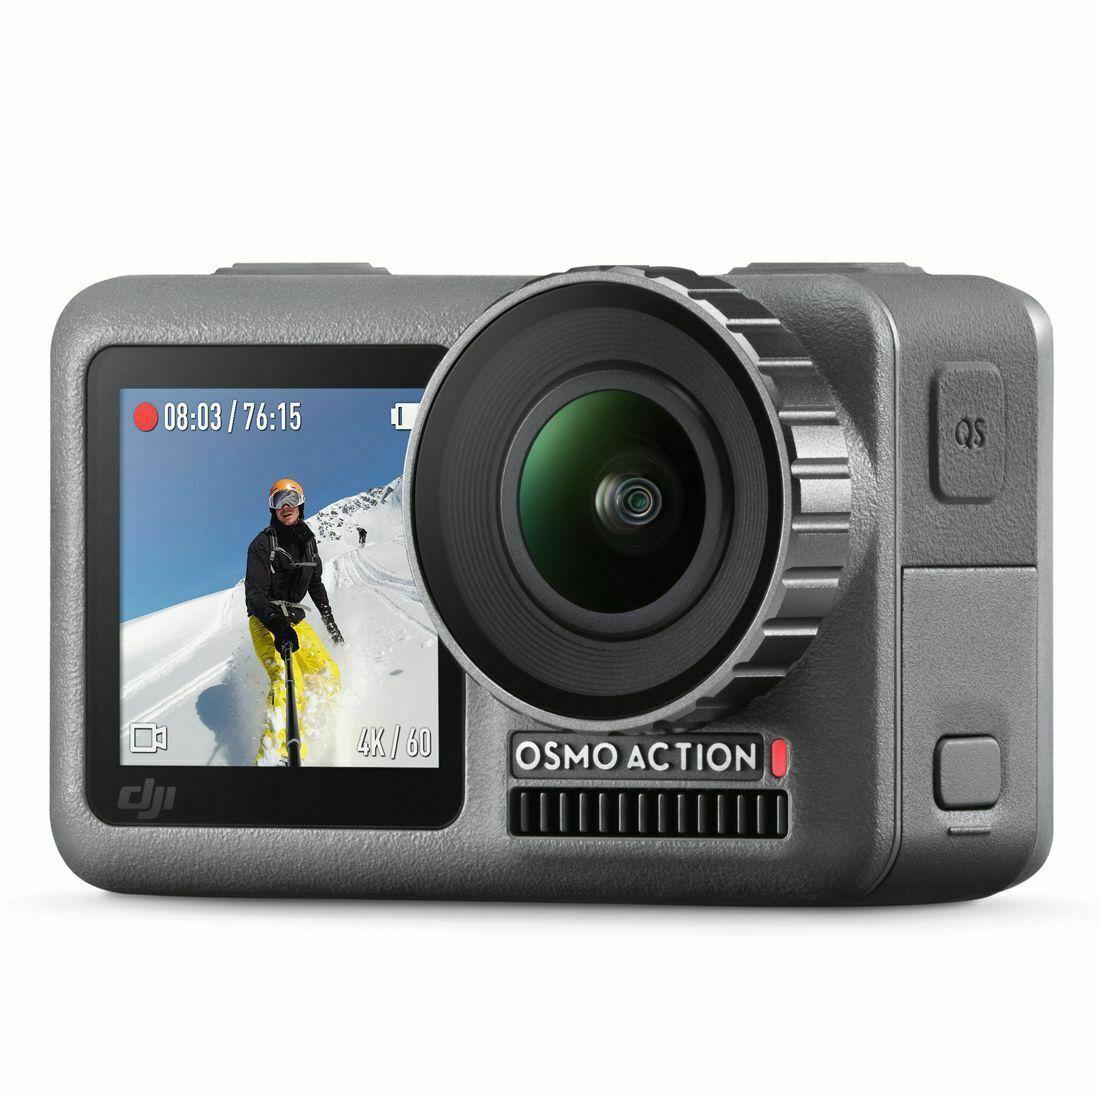 [eBay Plus] DJI Osmo Action 4K Action Camera $299 Delivered @ Allphones eBay